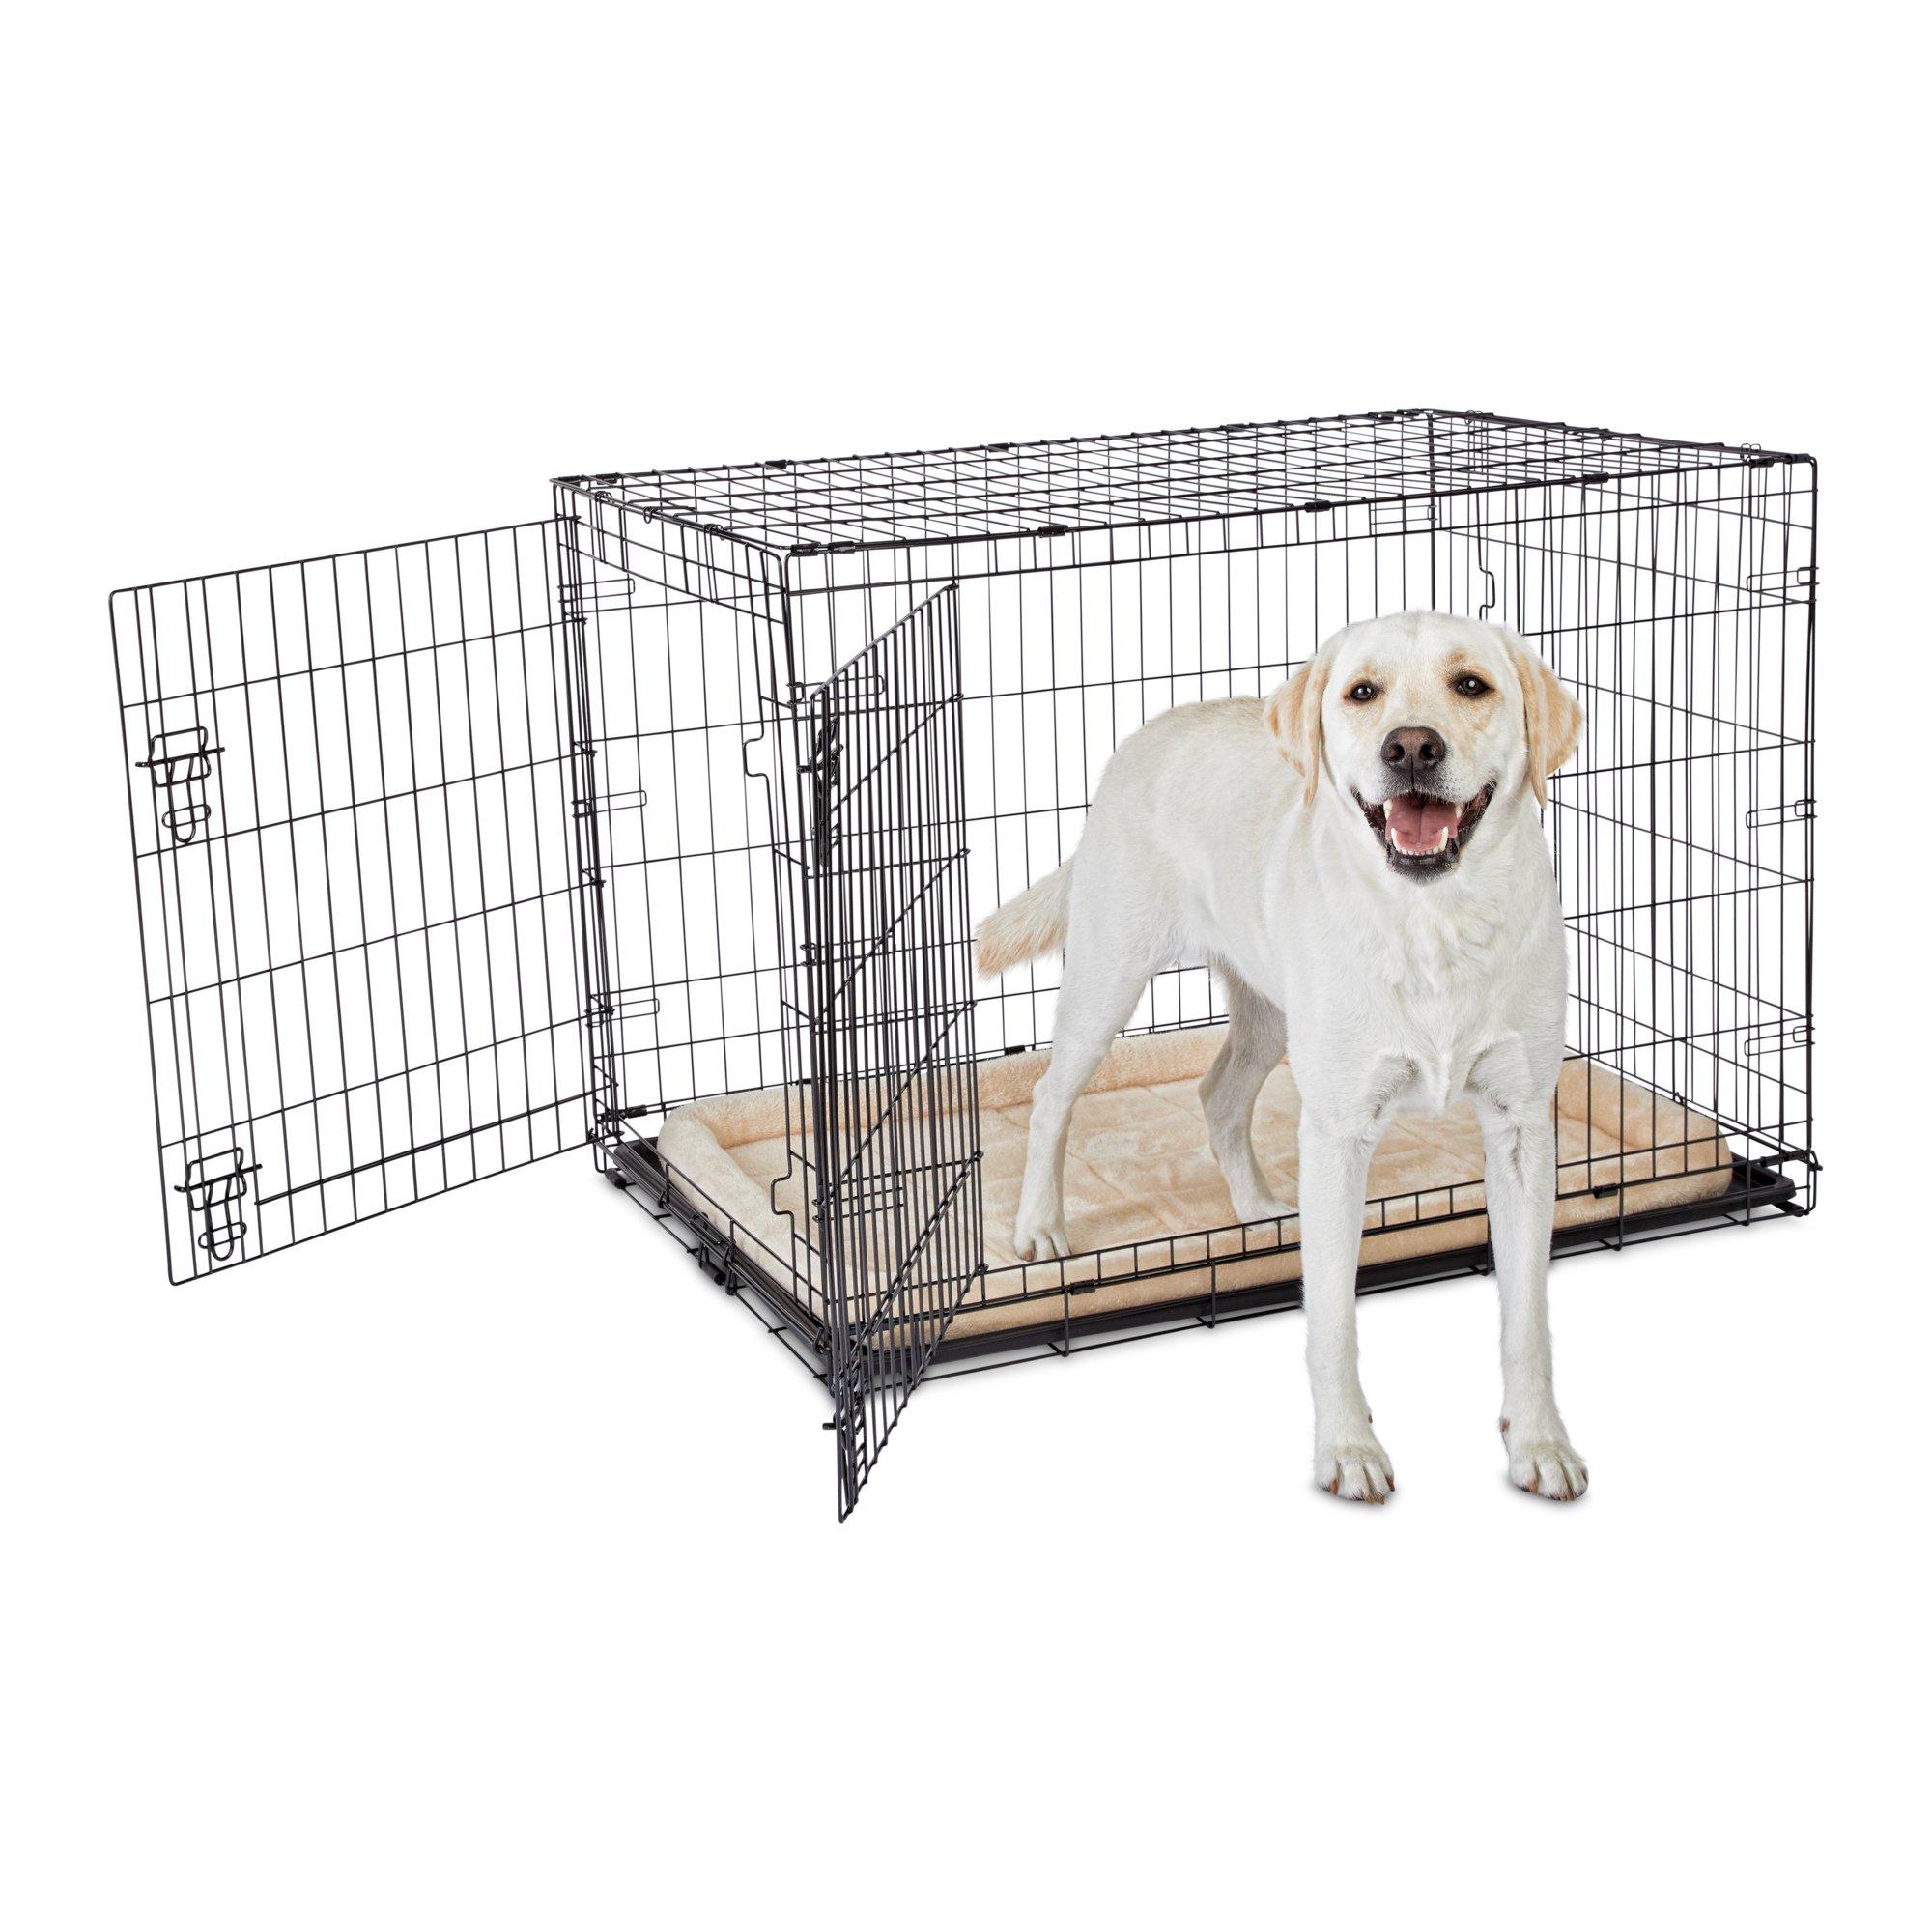 Animaze 2 Door Folding Dog Crate 42 8 L X 28 7 W X 30 3 H Folding Dog Crate Dog Crate Your Dog